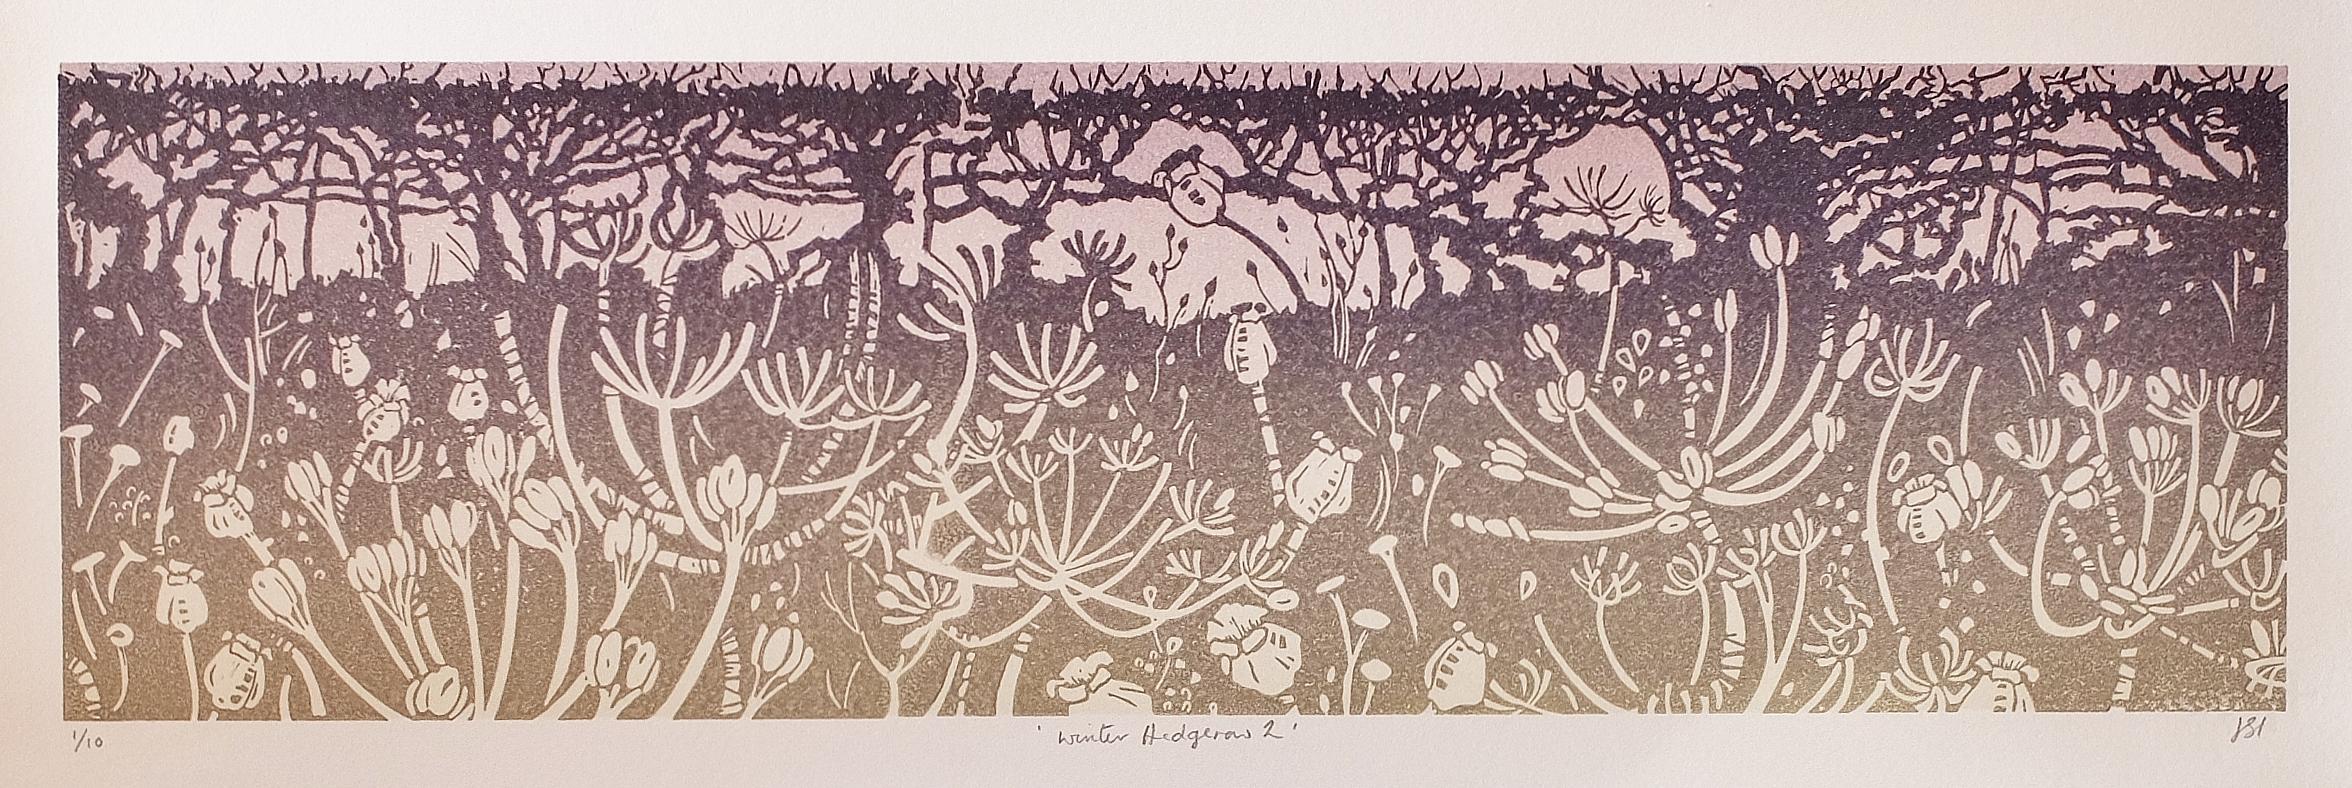 Winter Hedgerow 1, Unmounted, 140mm x 480mm, £120.00